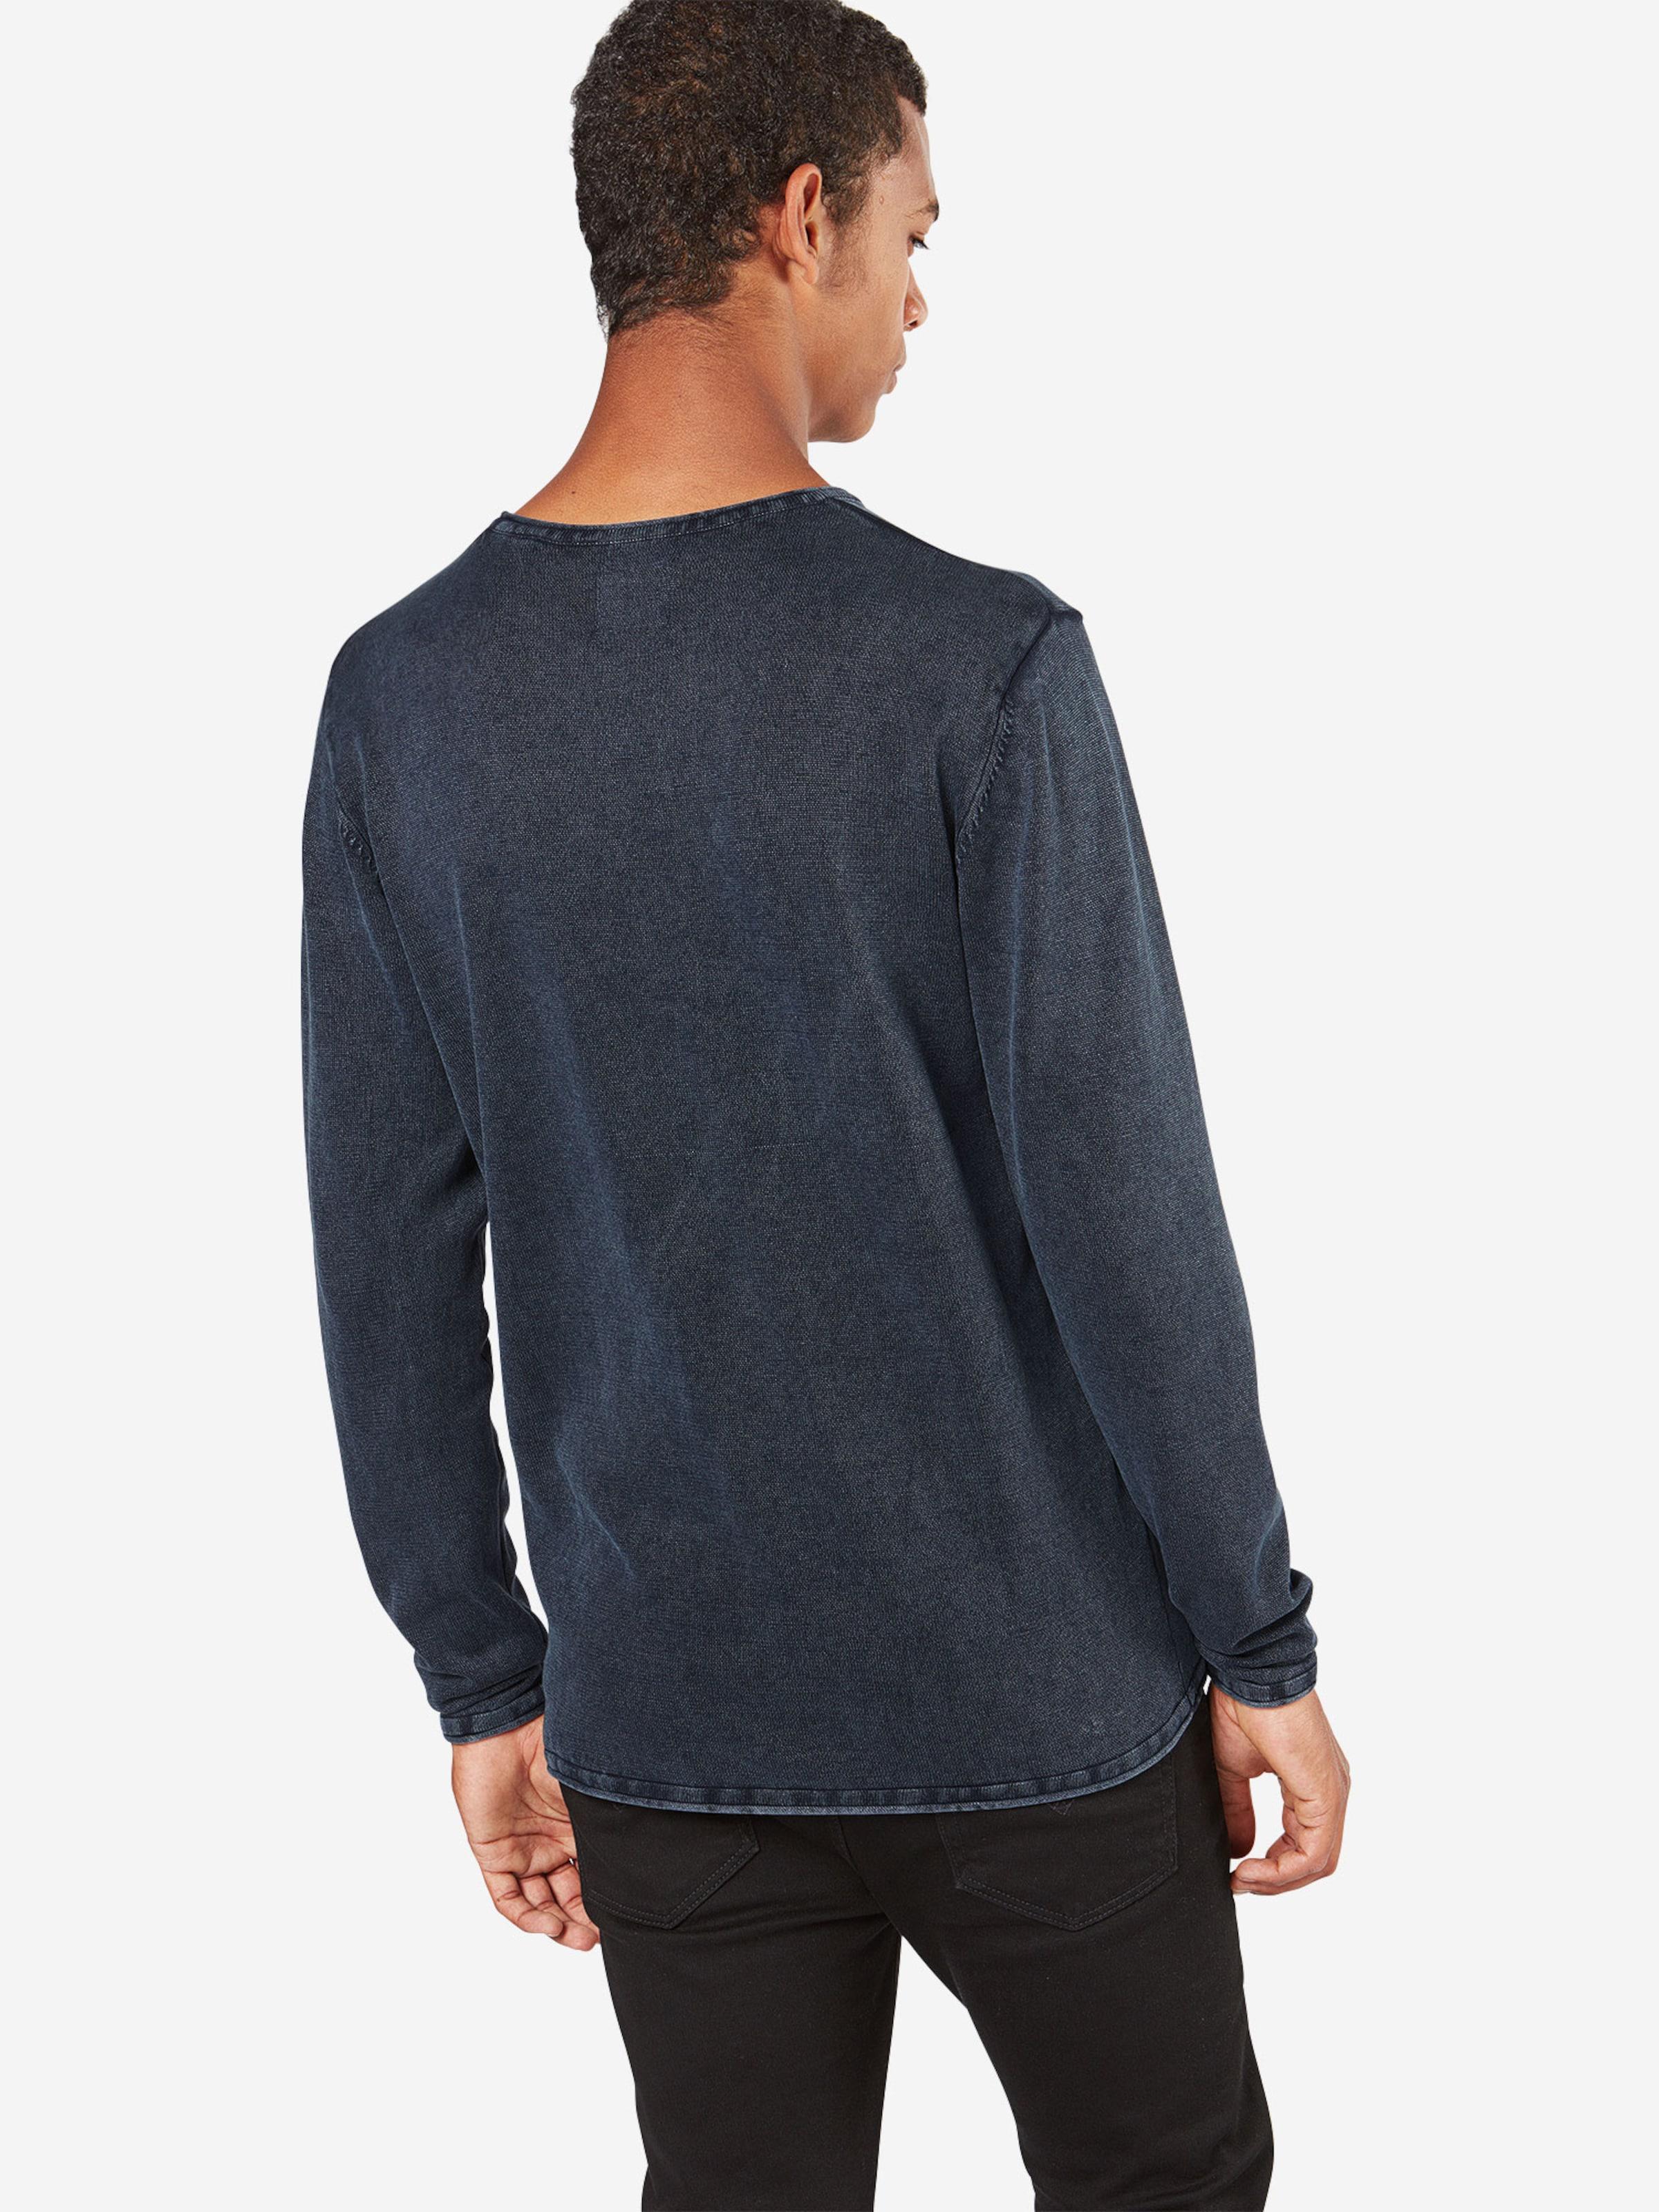 WASH CREW Langarm 'GARSON NECK Only NOOS' Shirt Sons amp; XqYnU7g